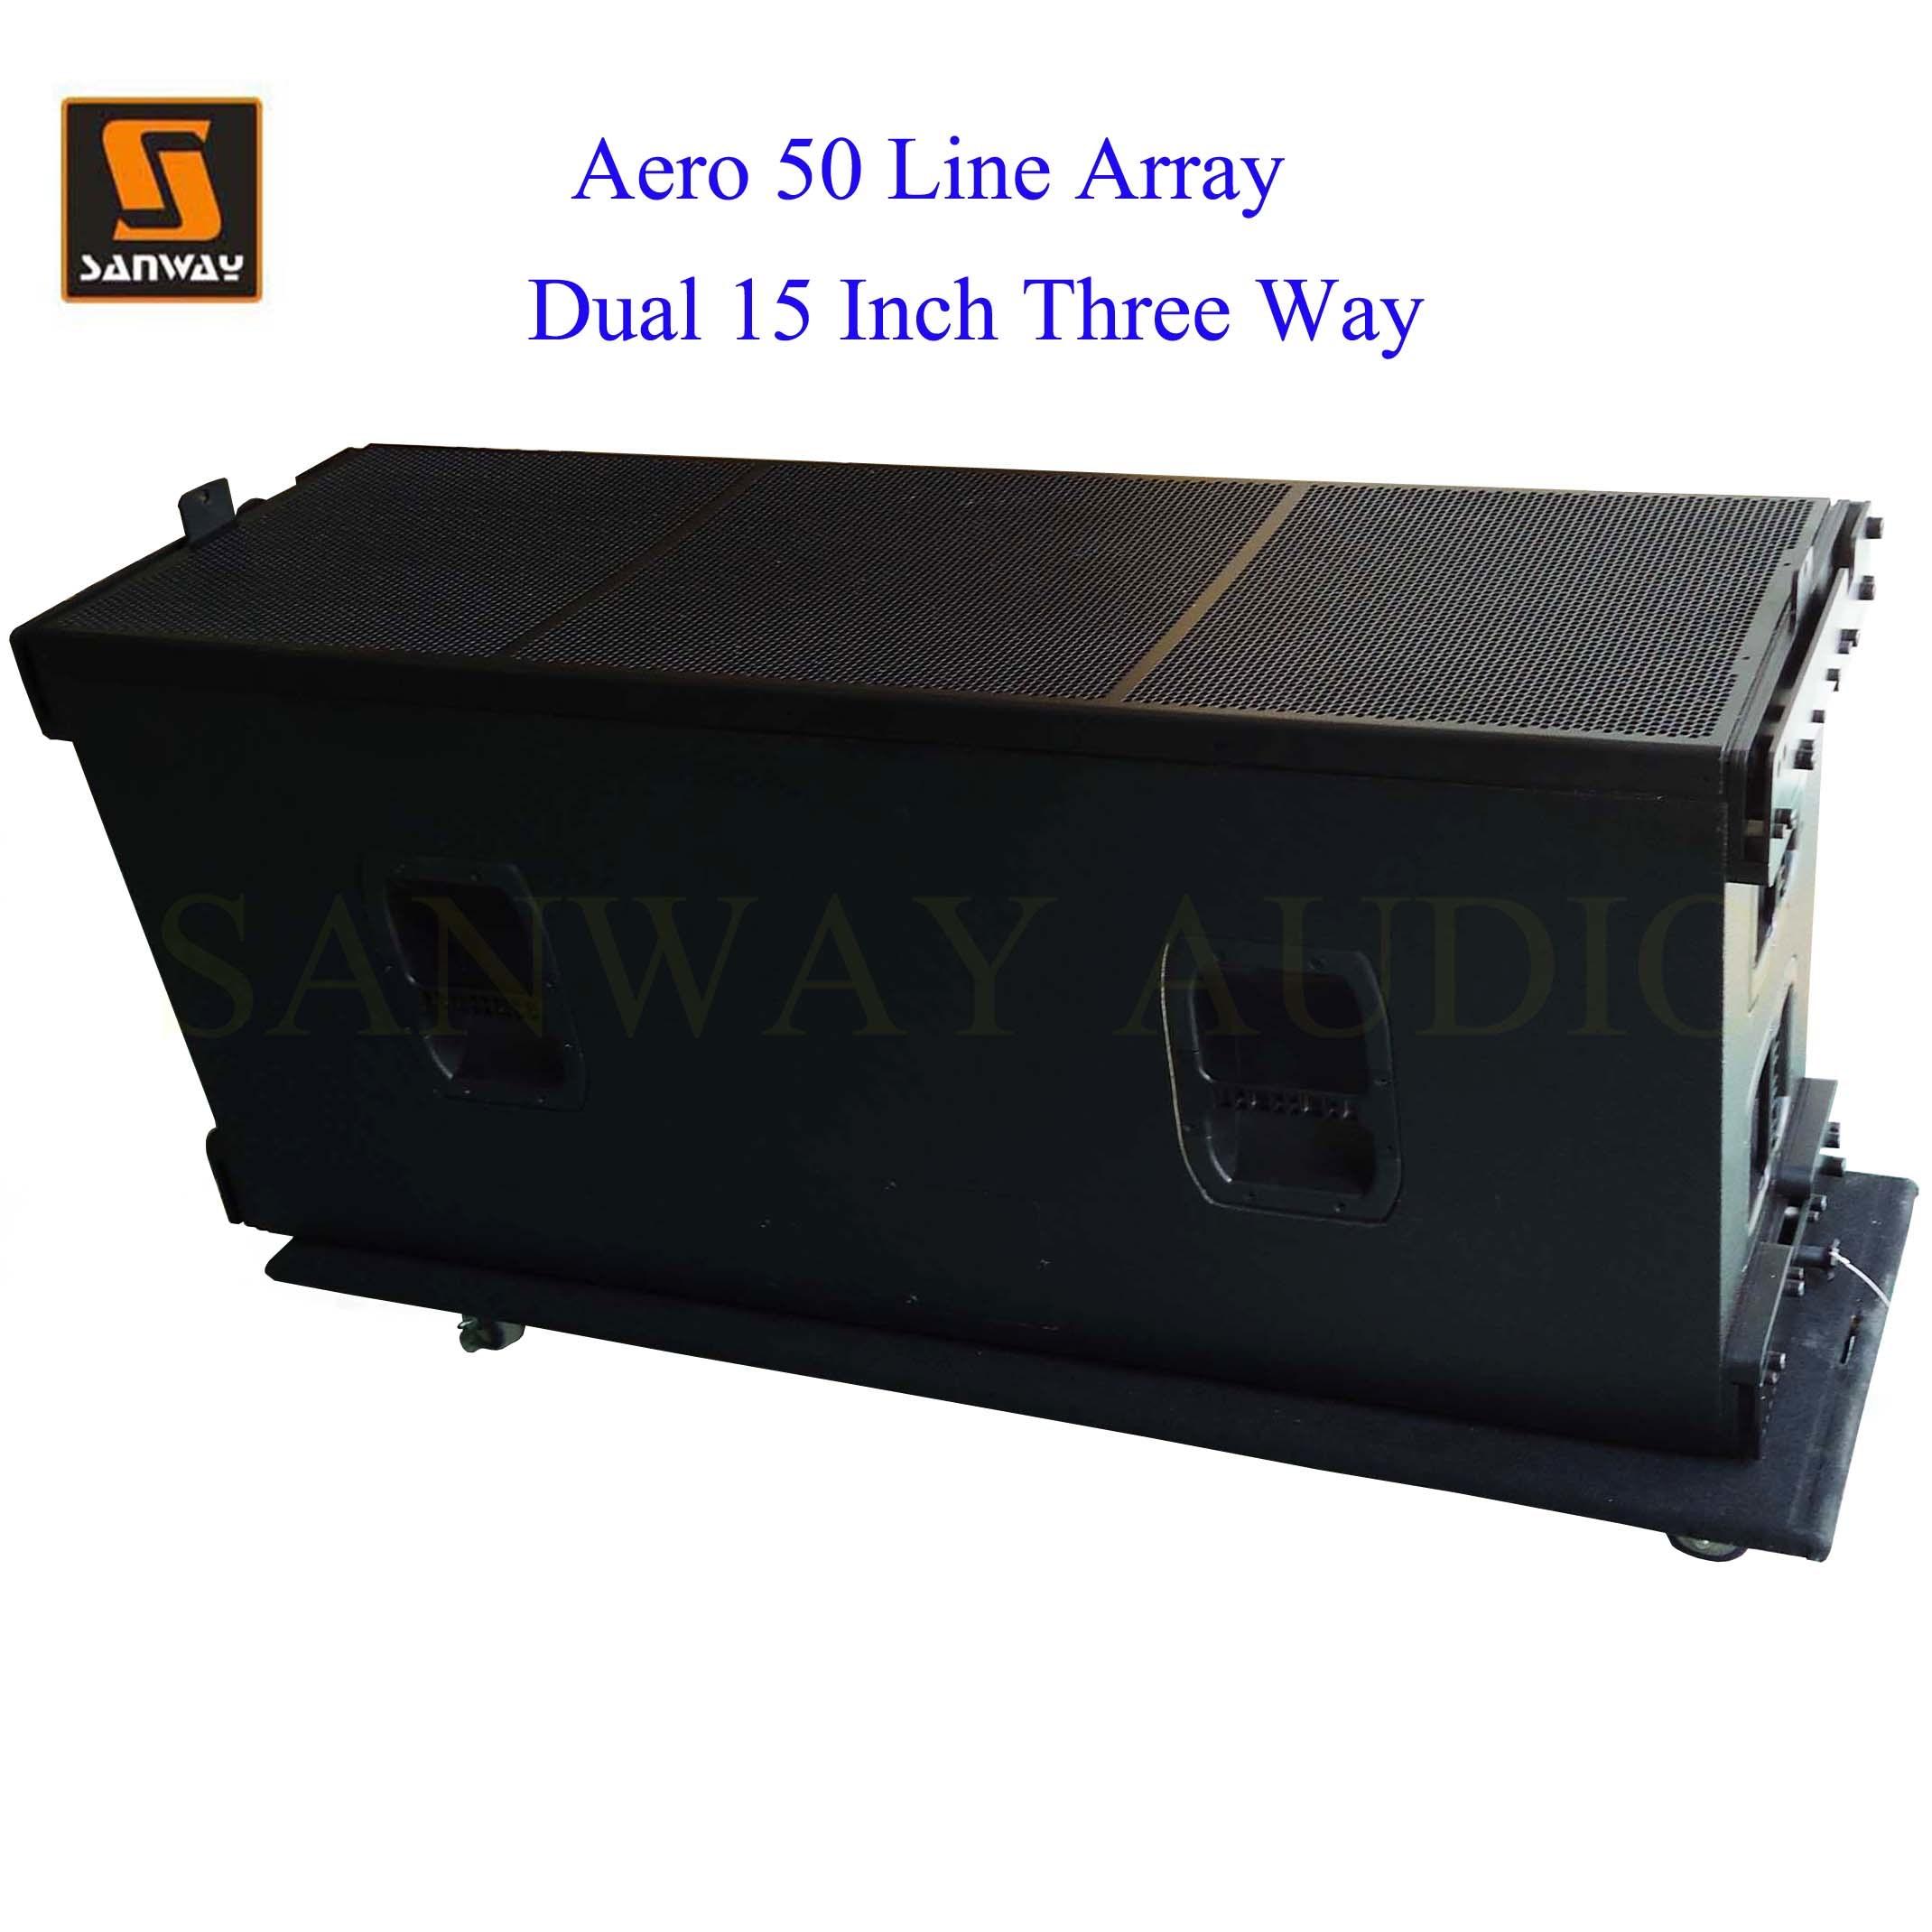 Three Way PRO Audio High System, Line Array Loudspeakers (AERO 50)